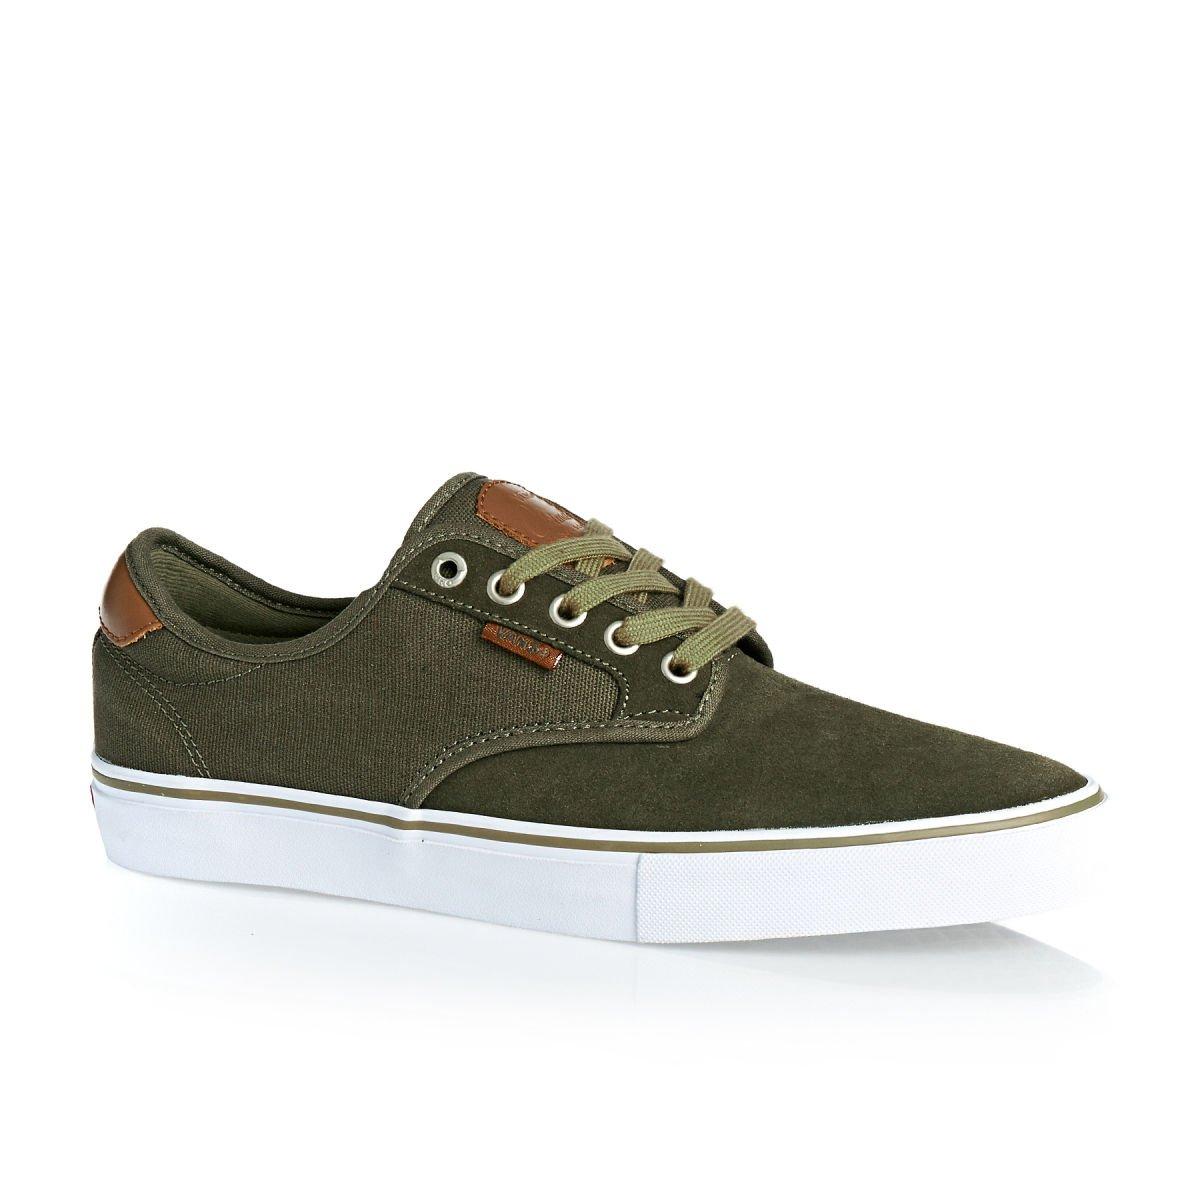 Vans Authentic, Zapatillas de skateboarding Unisex 10,5|Ivy Green/White